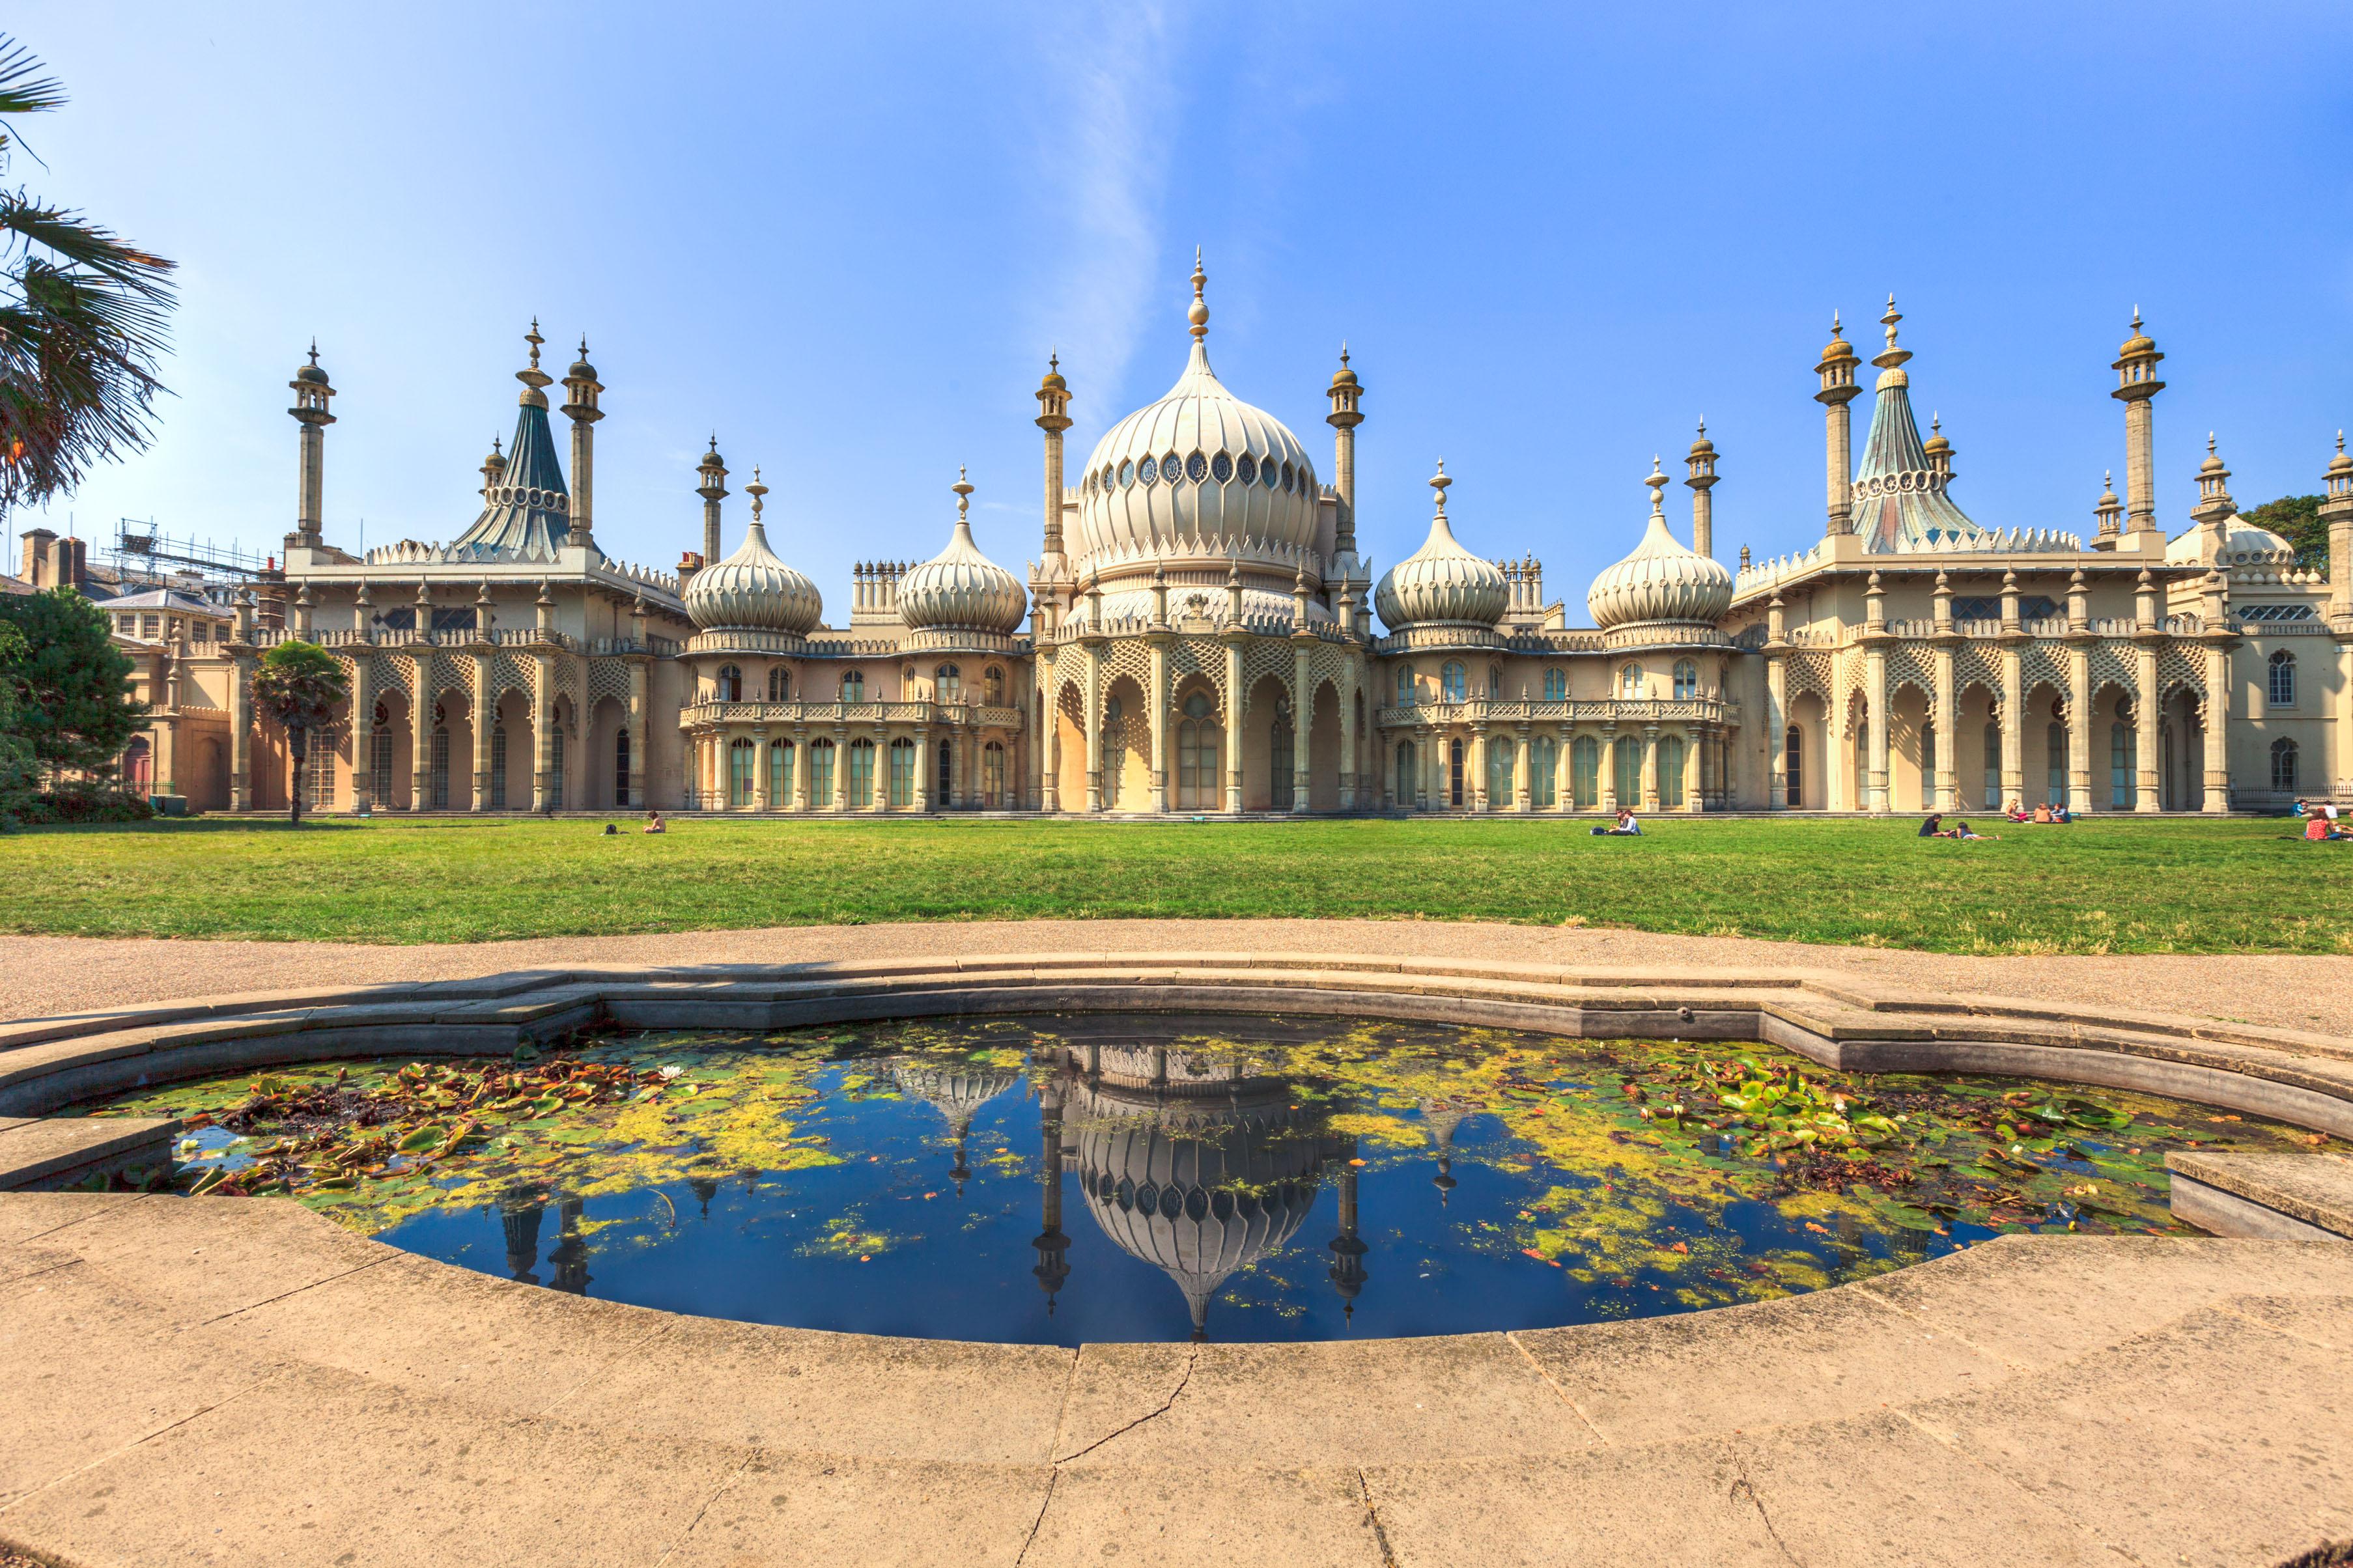 The_Royal_Pavilion_Brighton_UK